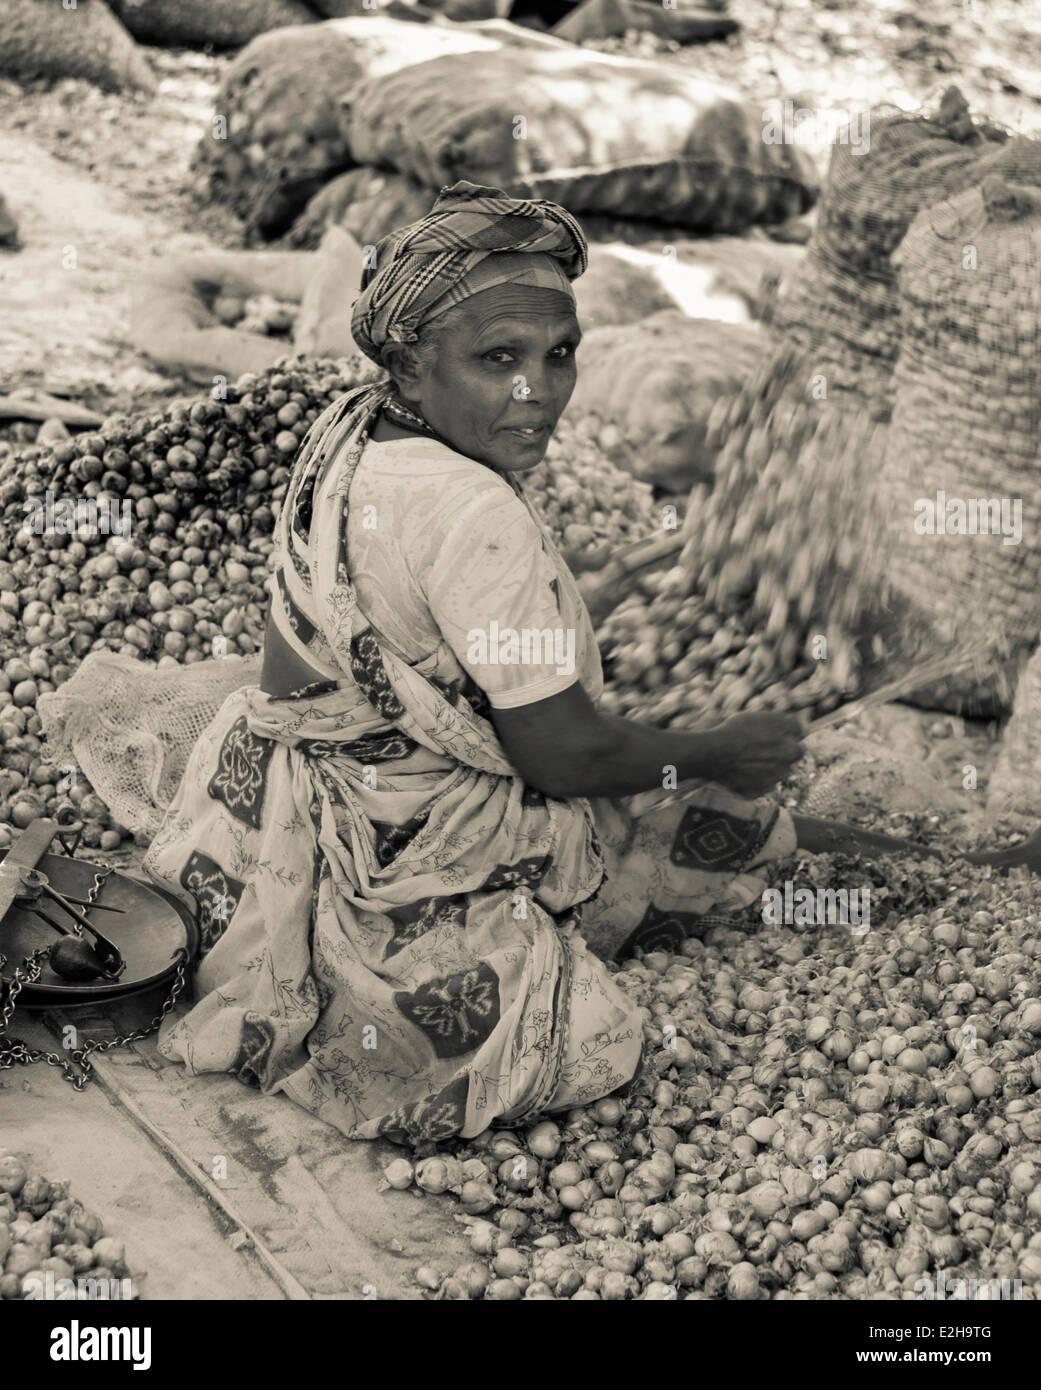 Indian woman sifting onions, Indian market, Chinnamanur, Tamil Nadu, India - Stock Image